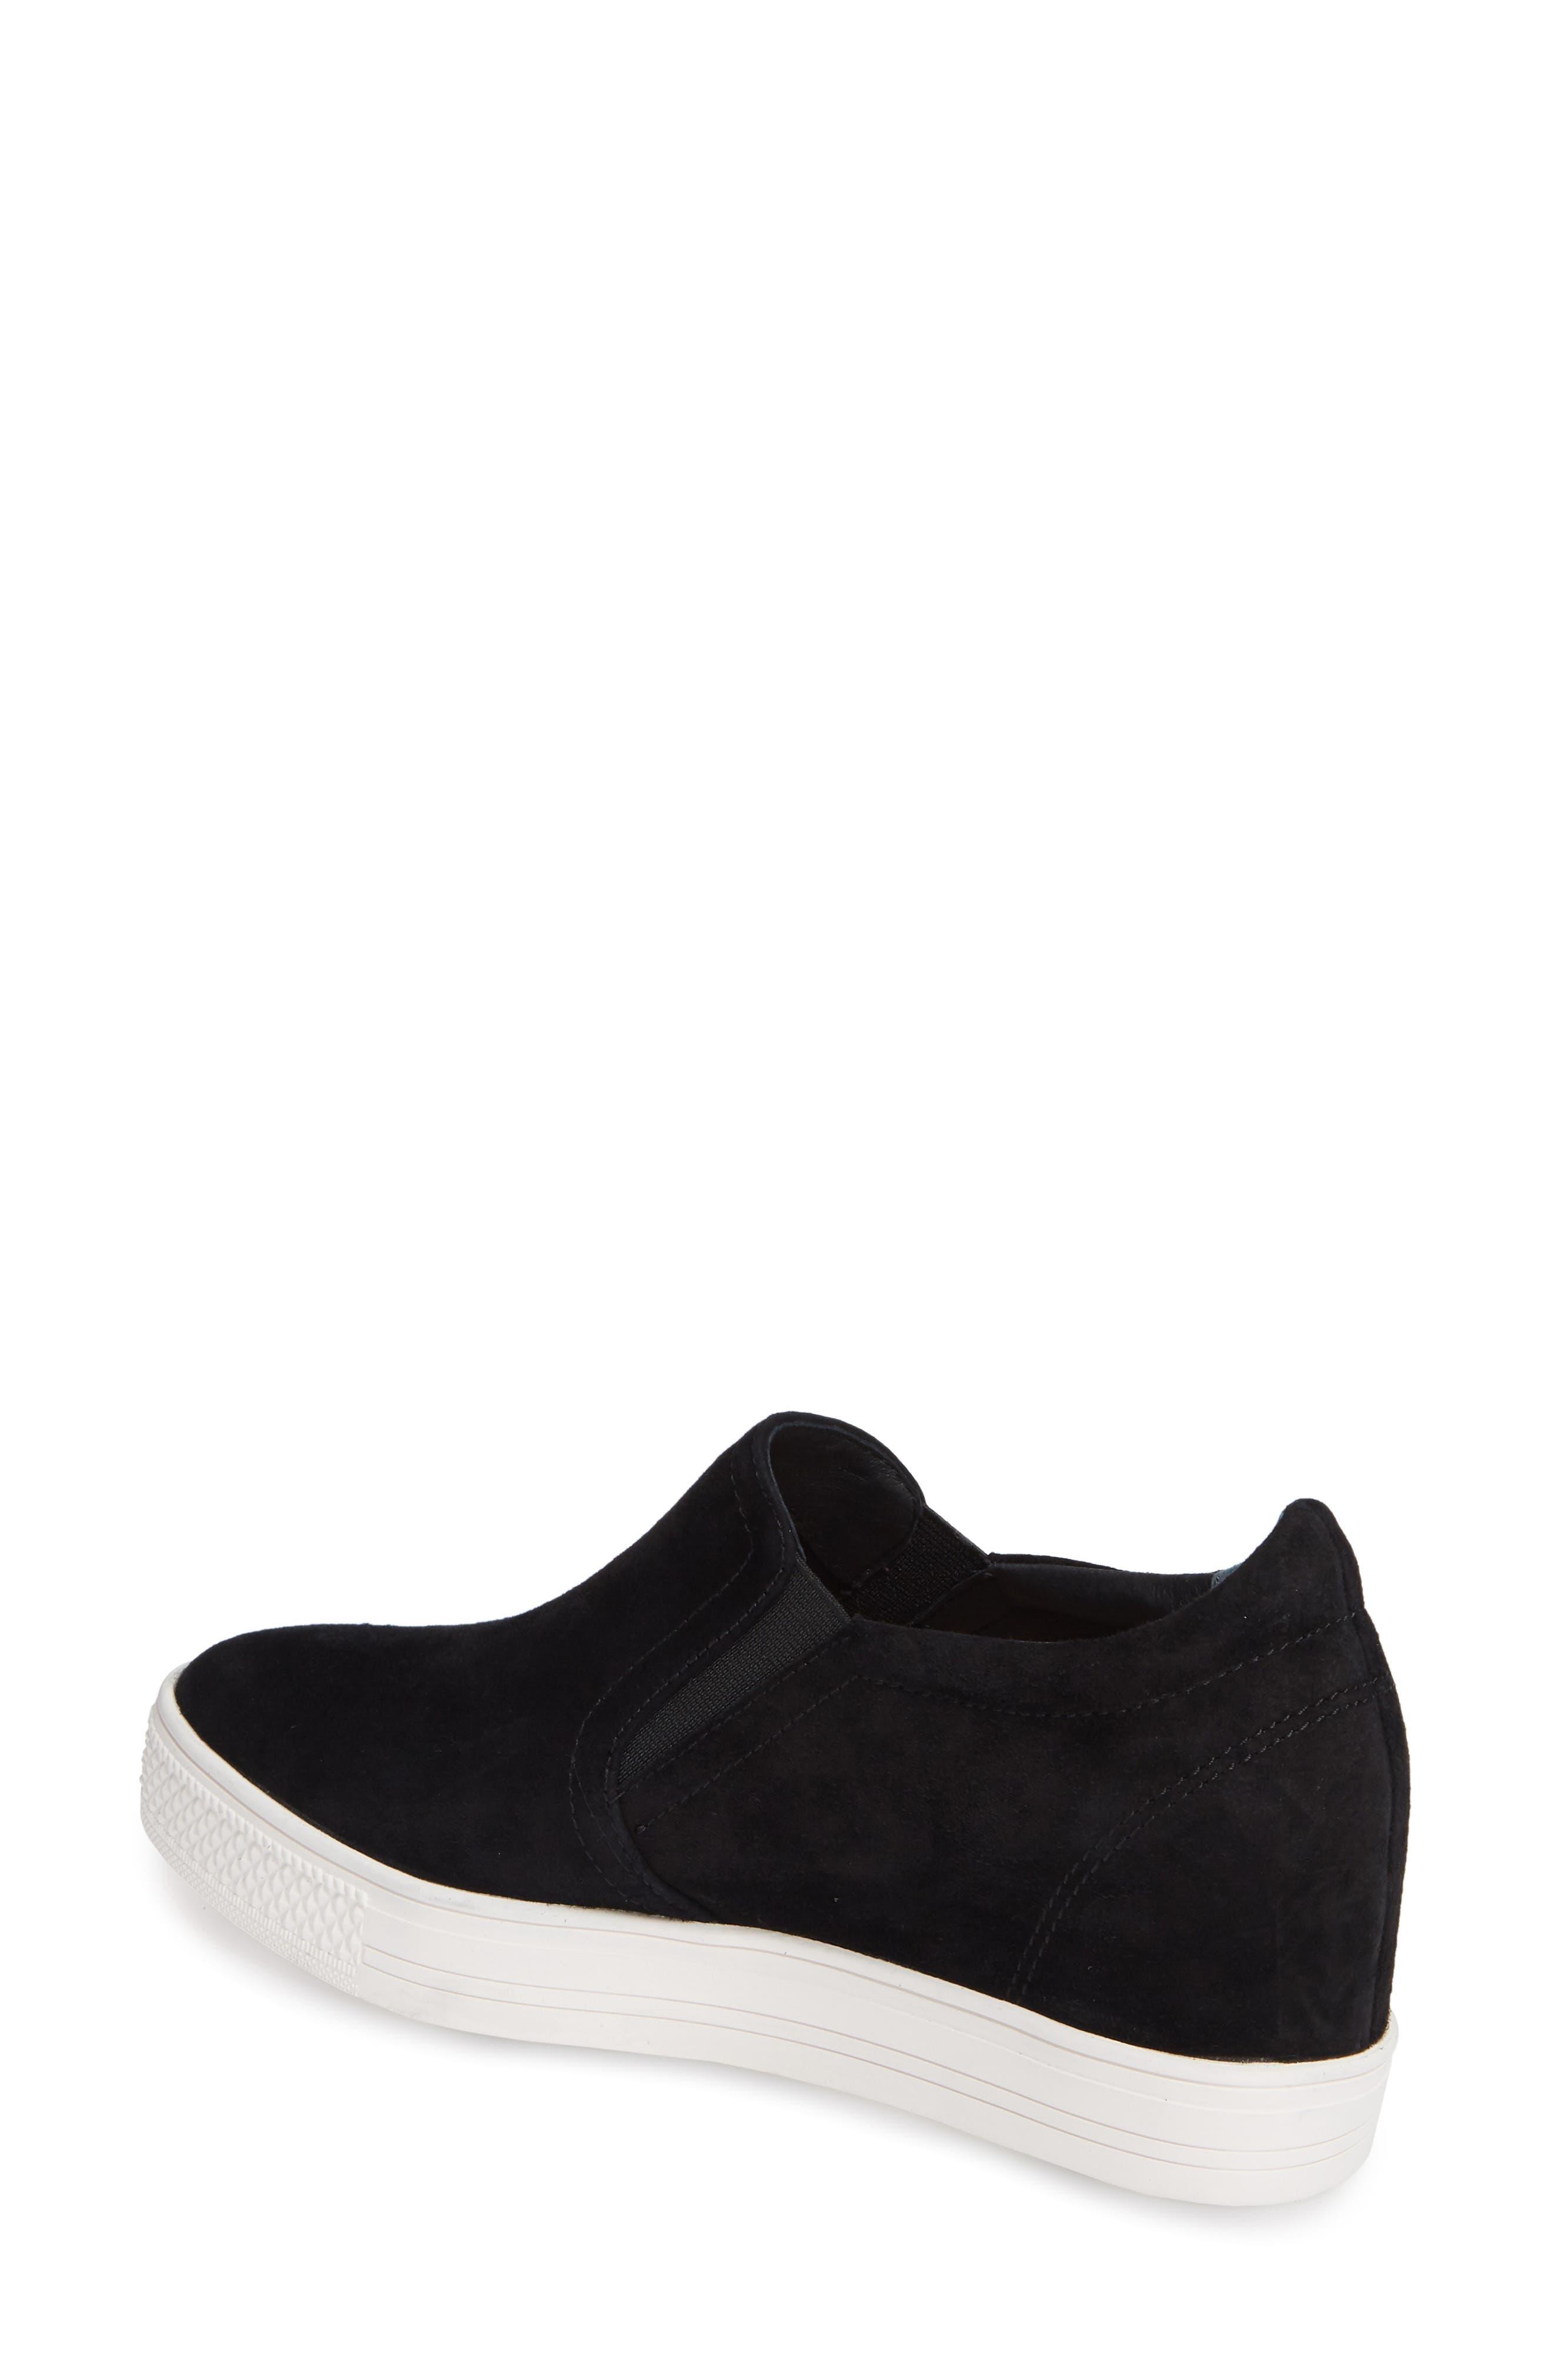 CASLON<SUP>®</SUP>, Austin Slip-On Sneaker, Alternate thumbnail 2, color, BLACK SUEDE